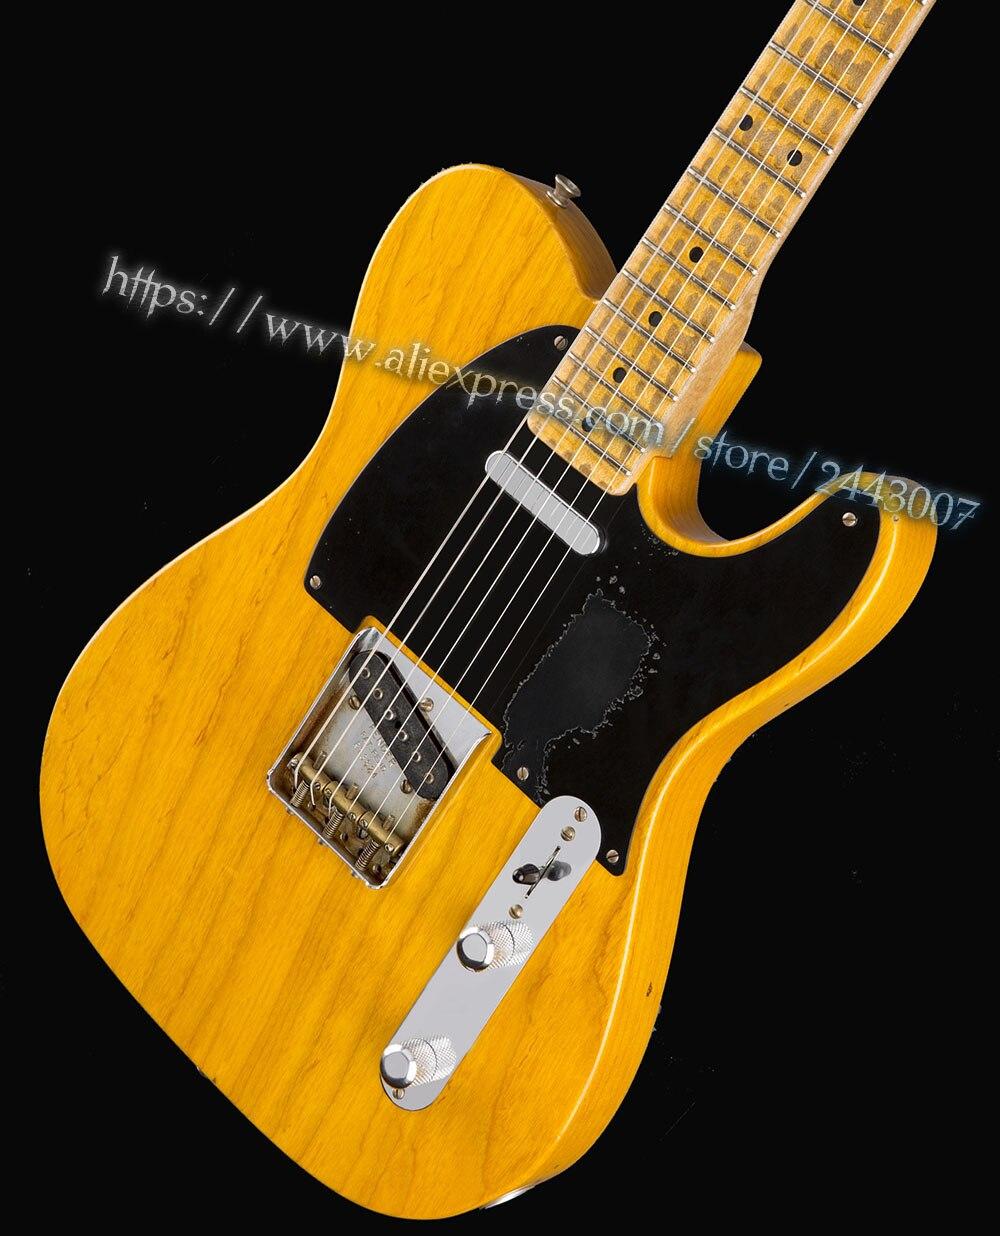 GC Custom Shop Mike Campbell Heartbreaker LTD Butterscotch Blonde Electric Guitar электрогитара с двумя вырезами prs se custom 24 zw ltd